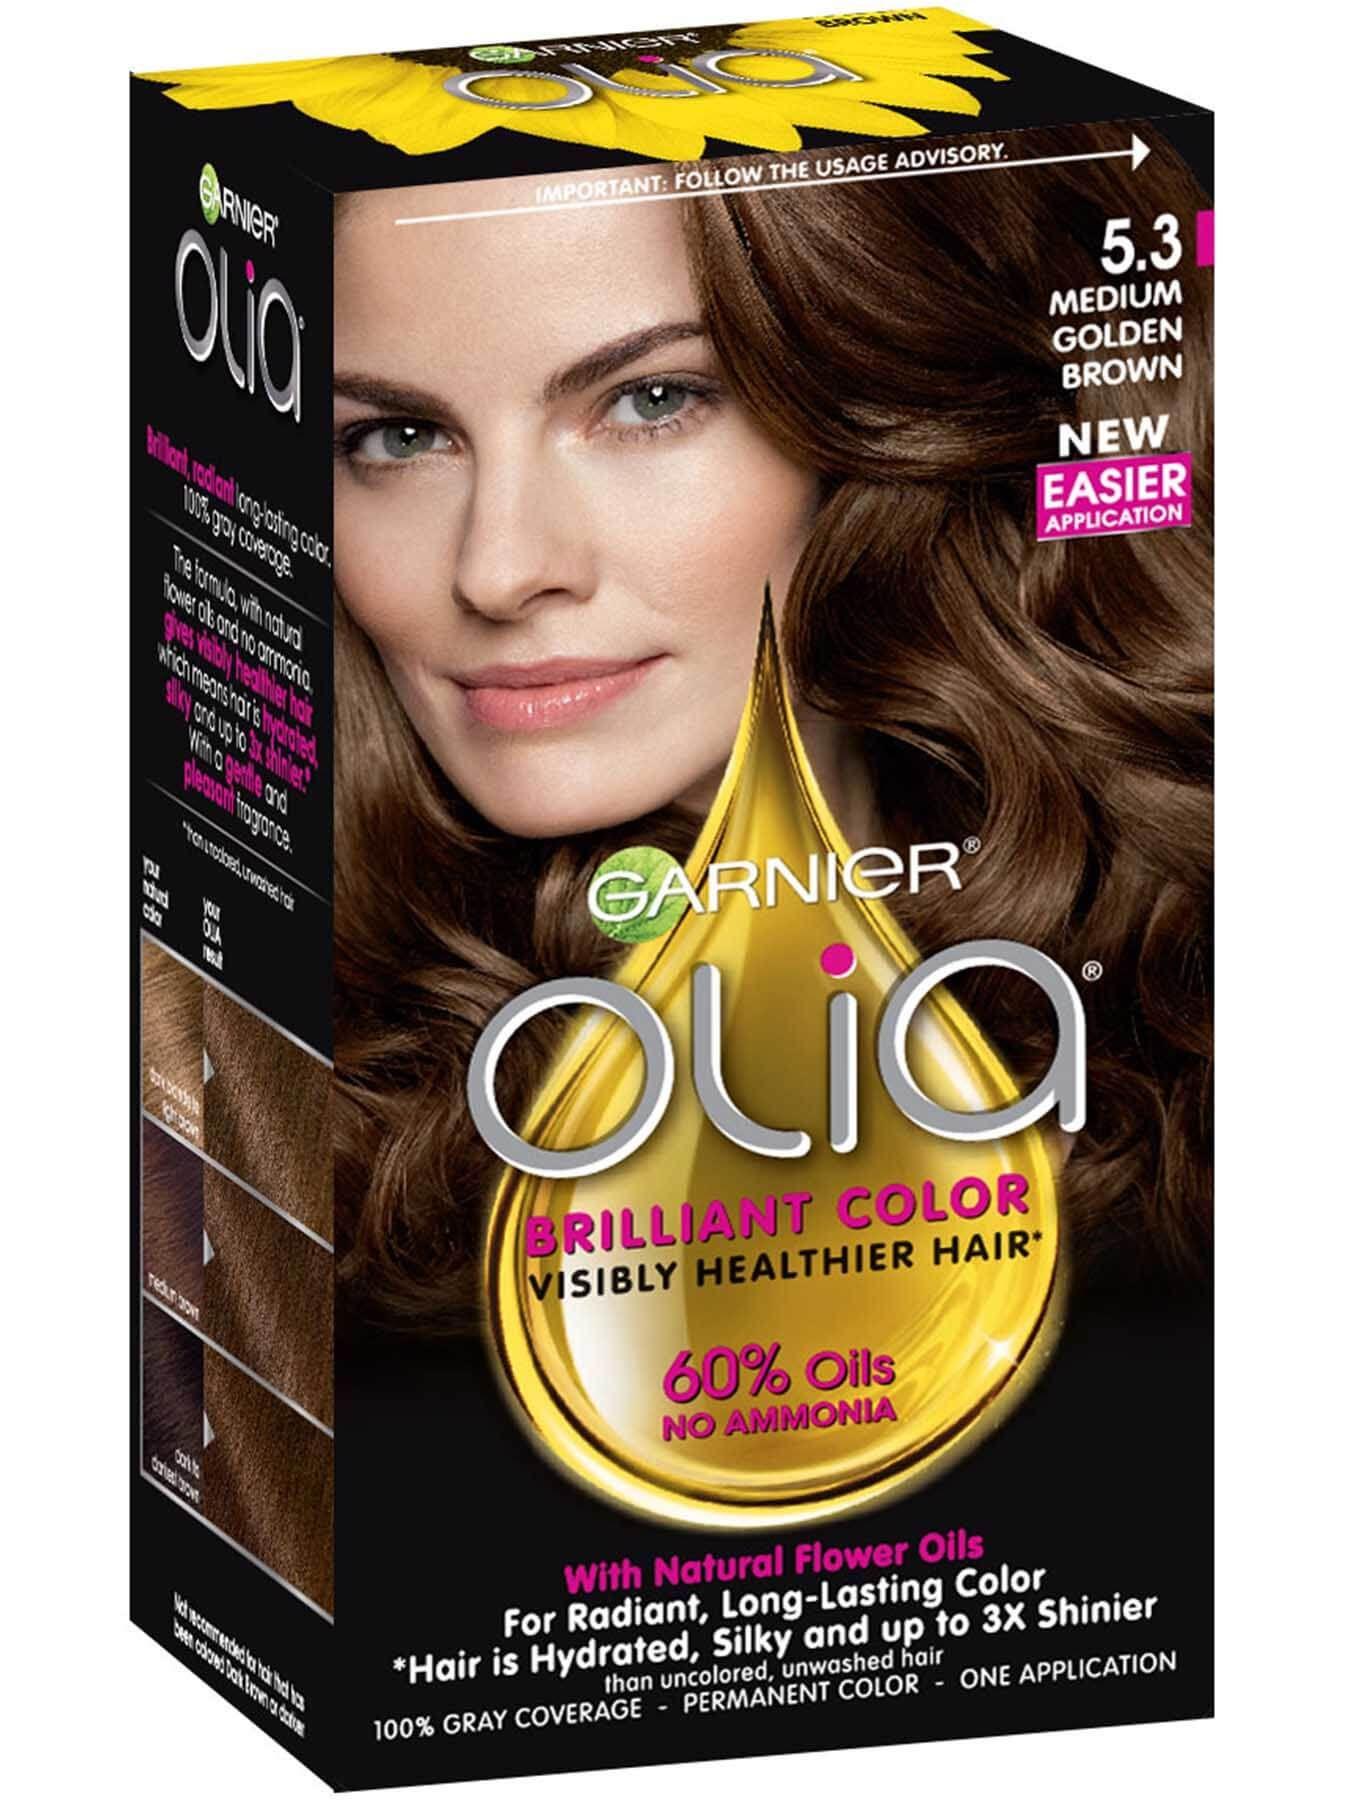 Olia 5 3 Medium Golden Brown Garnier Hair Color Permanent